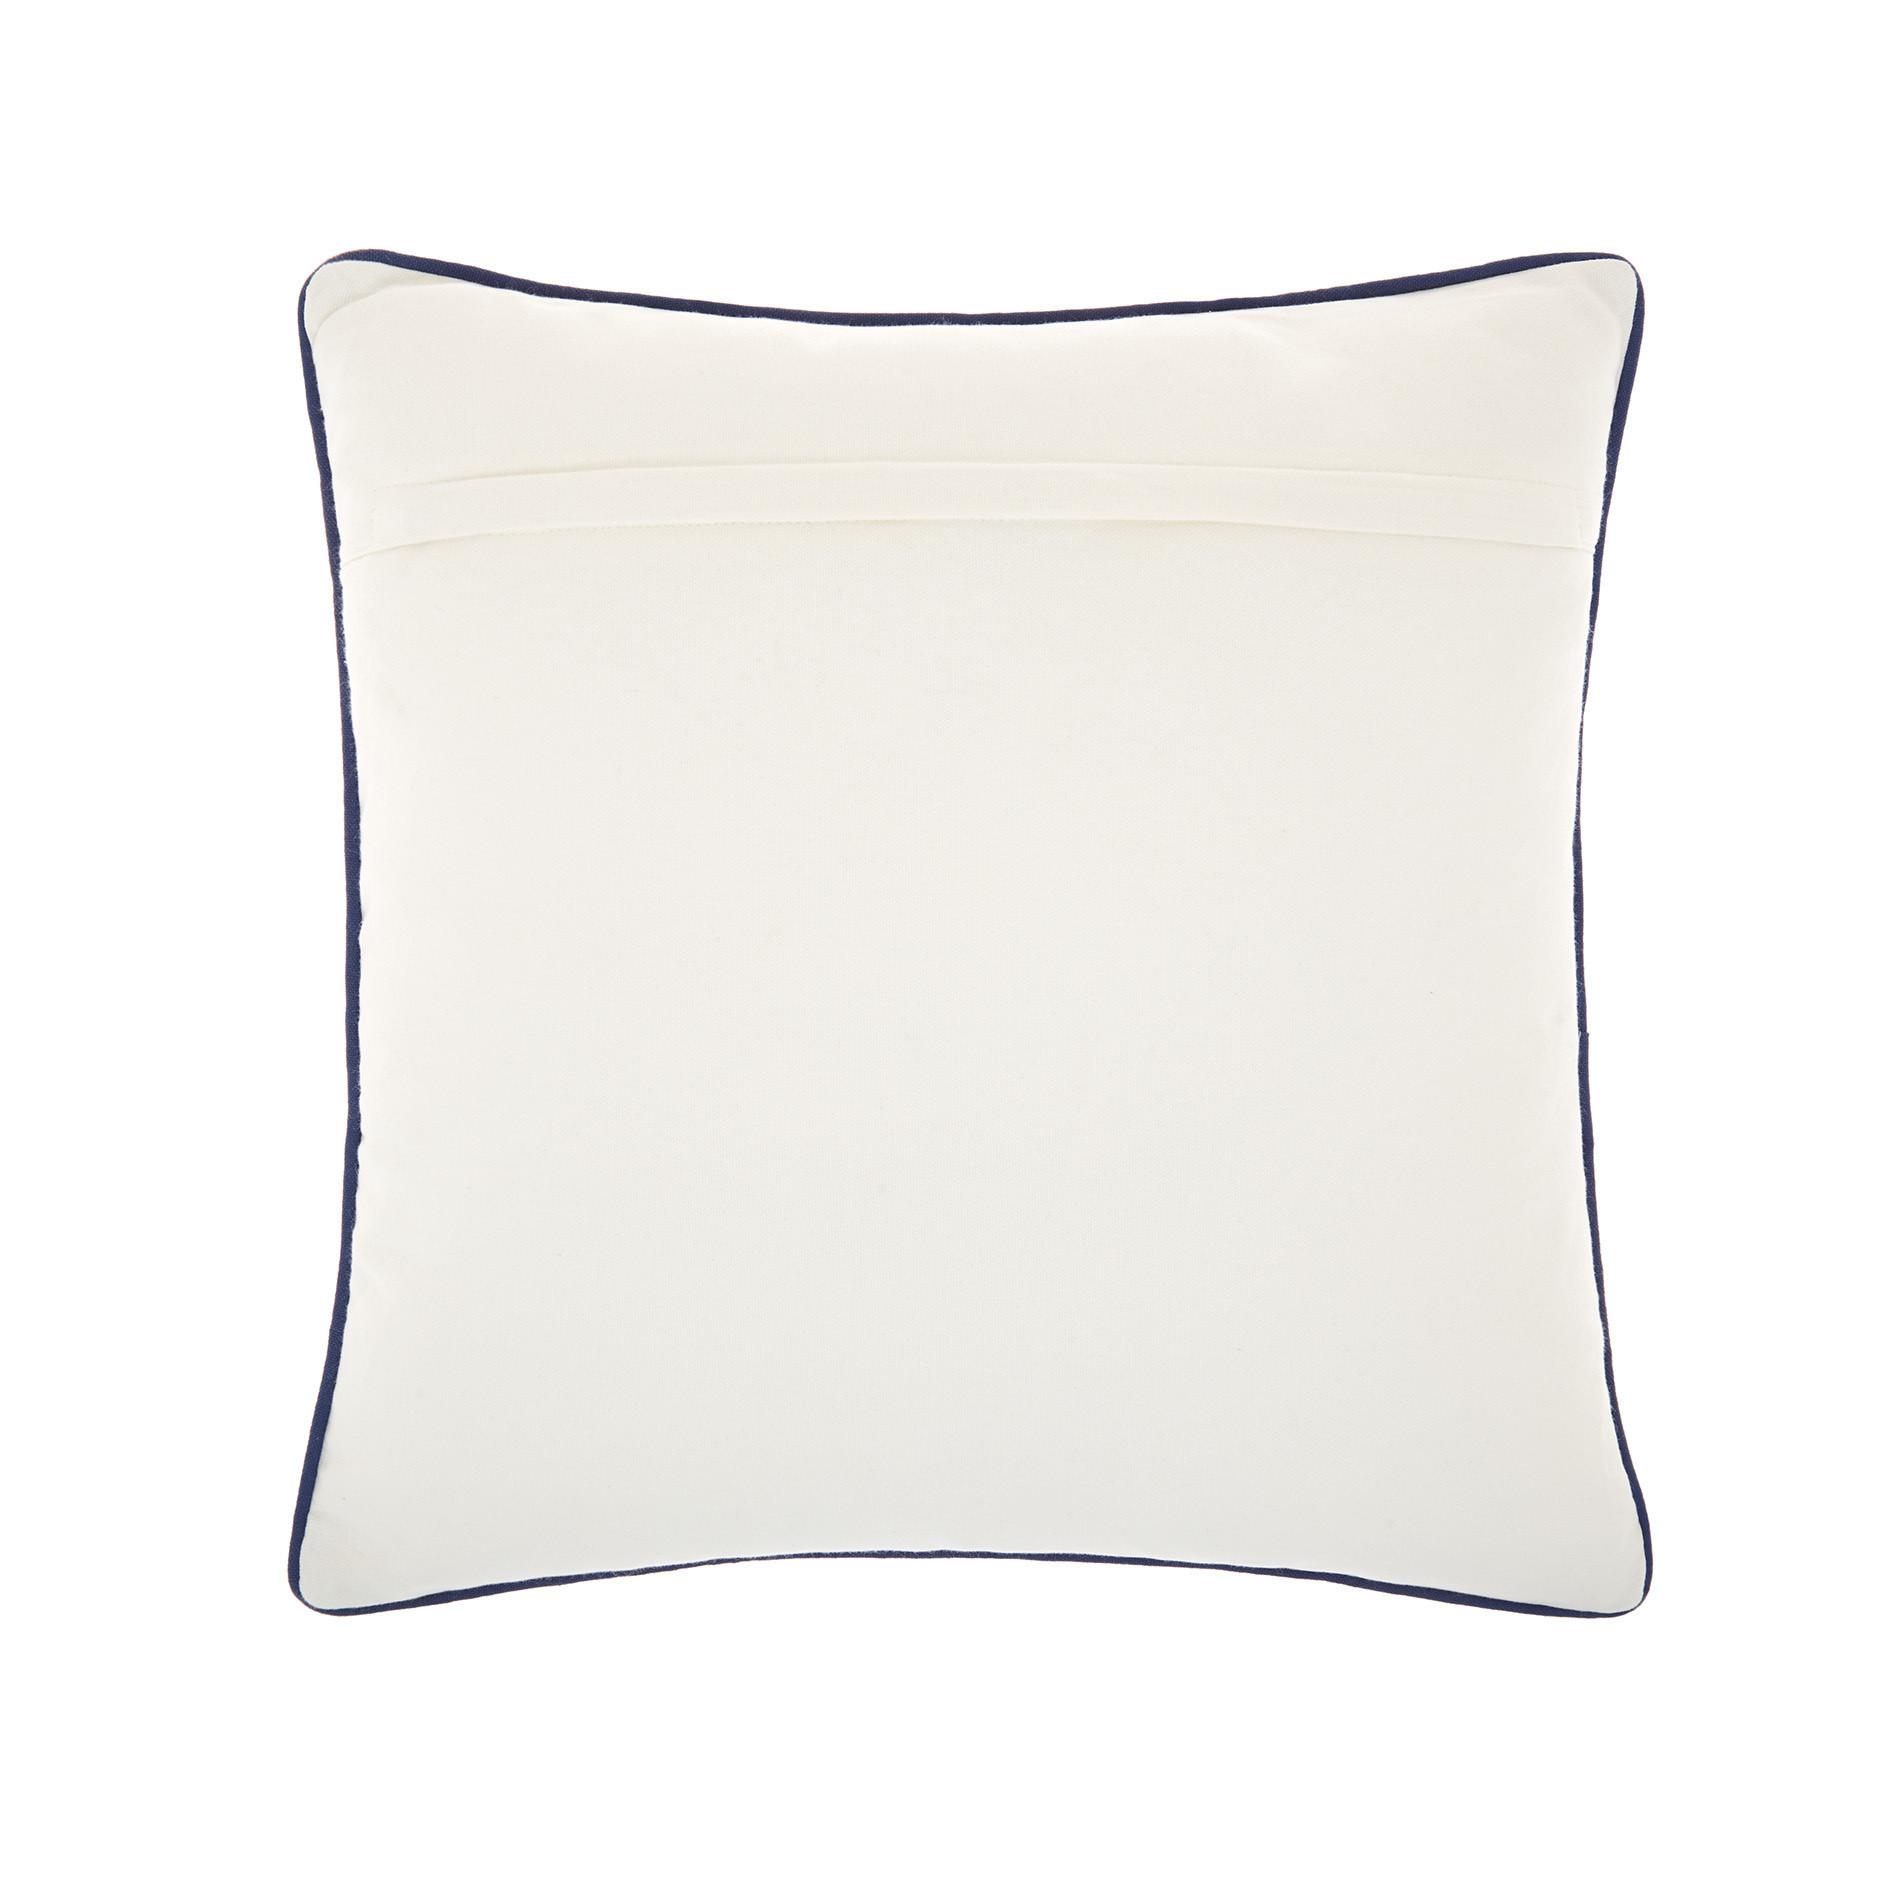 Cuscino ricamo pesci 45x45cm, Bianco, large image number 1